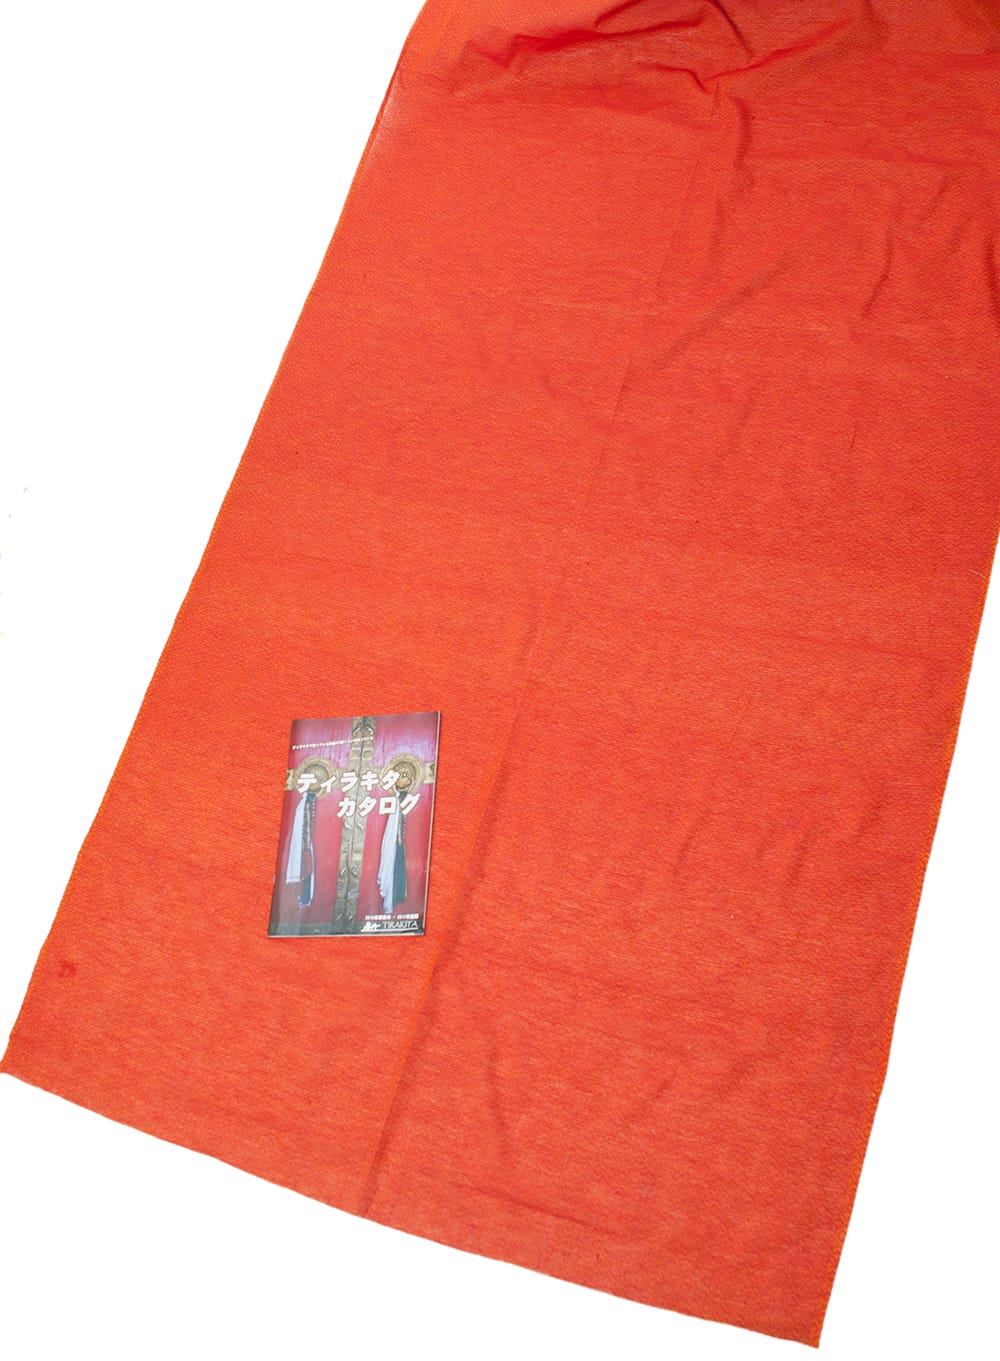 〔1m切り売り〕インドのシンプルコットン布 - 小花オレンジレッド 〔幅約110cm〕の写真